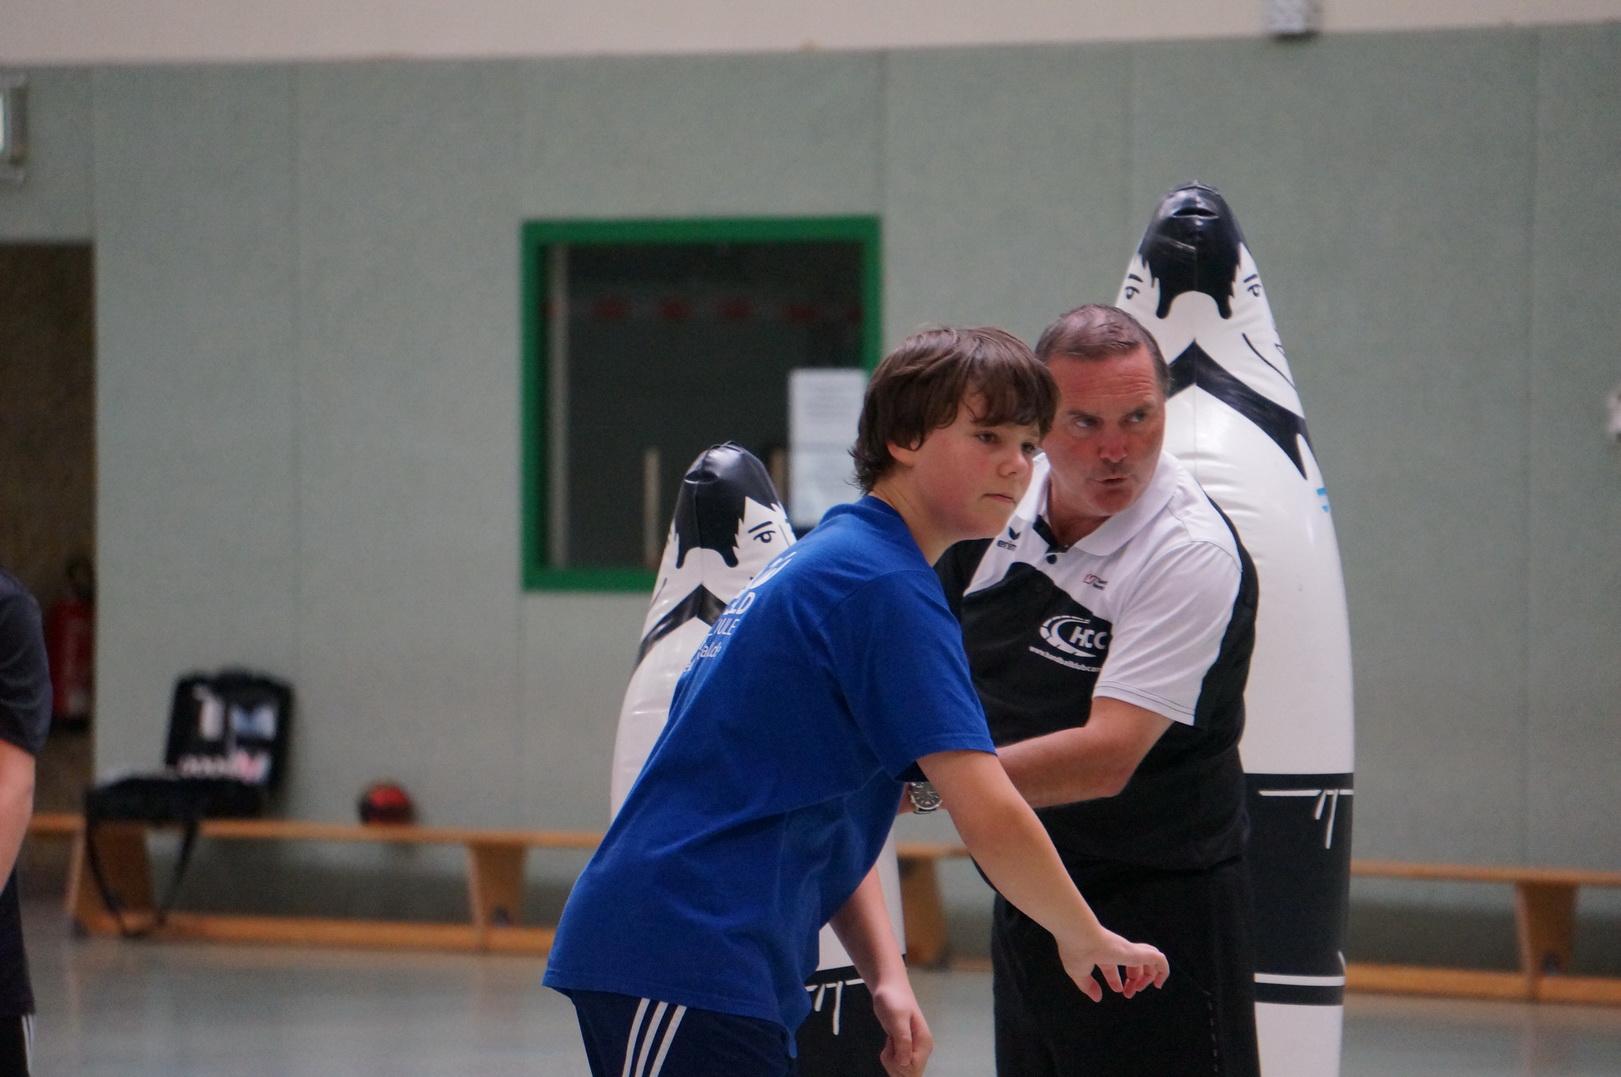 201808_Handballcamp_SDH_MG_218w